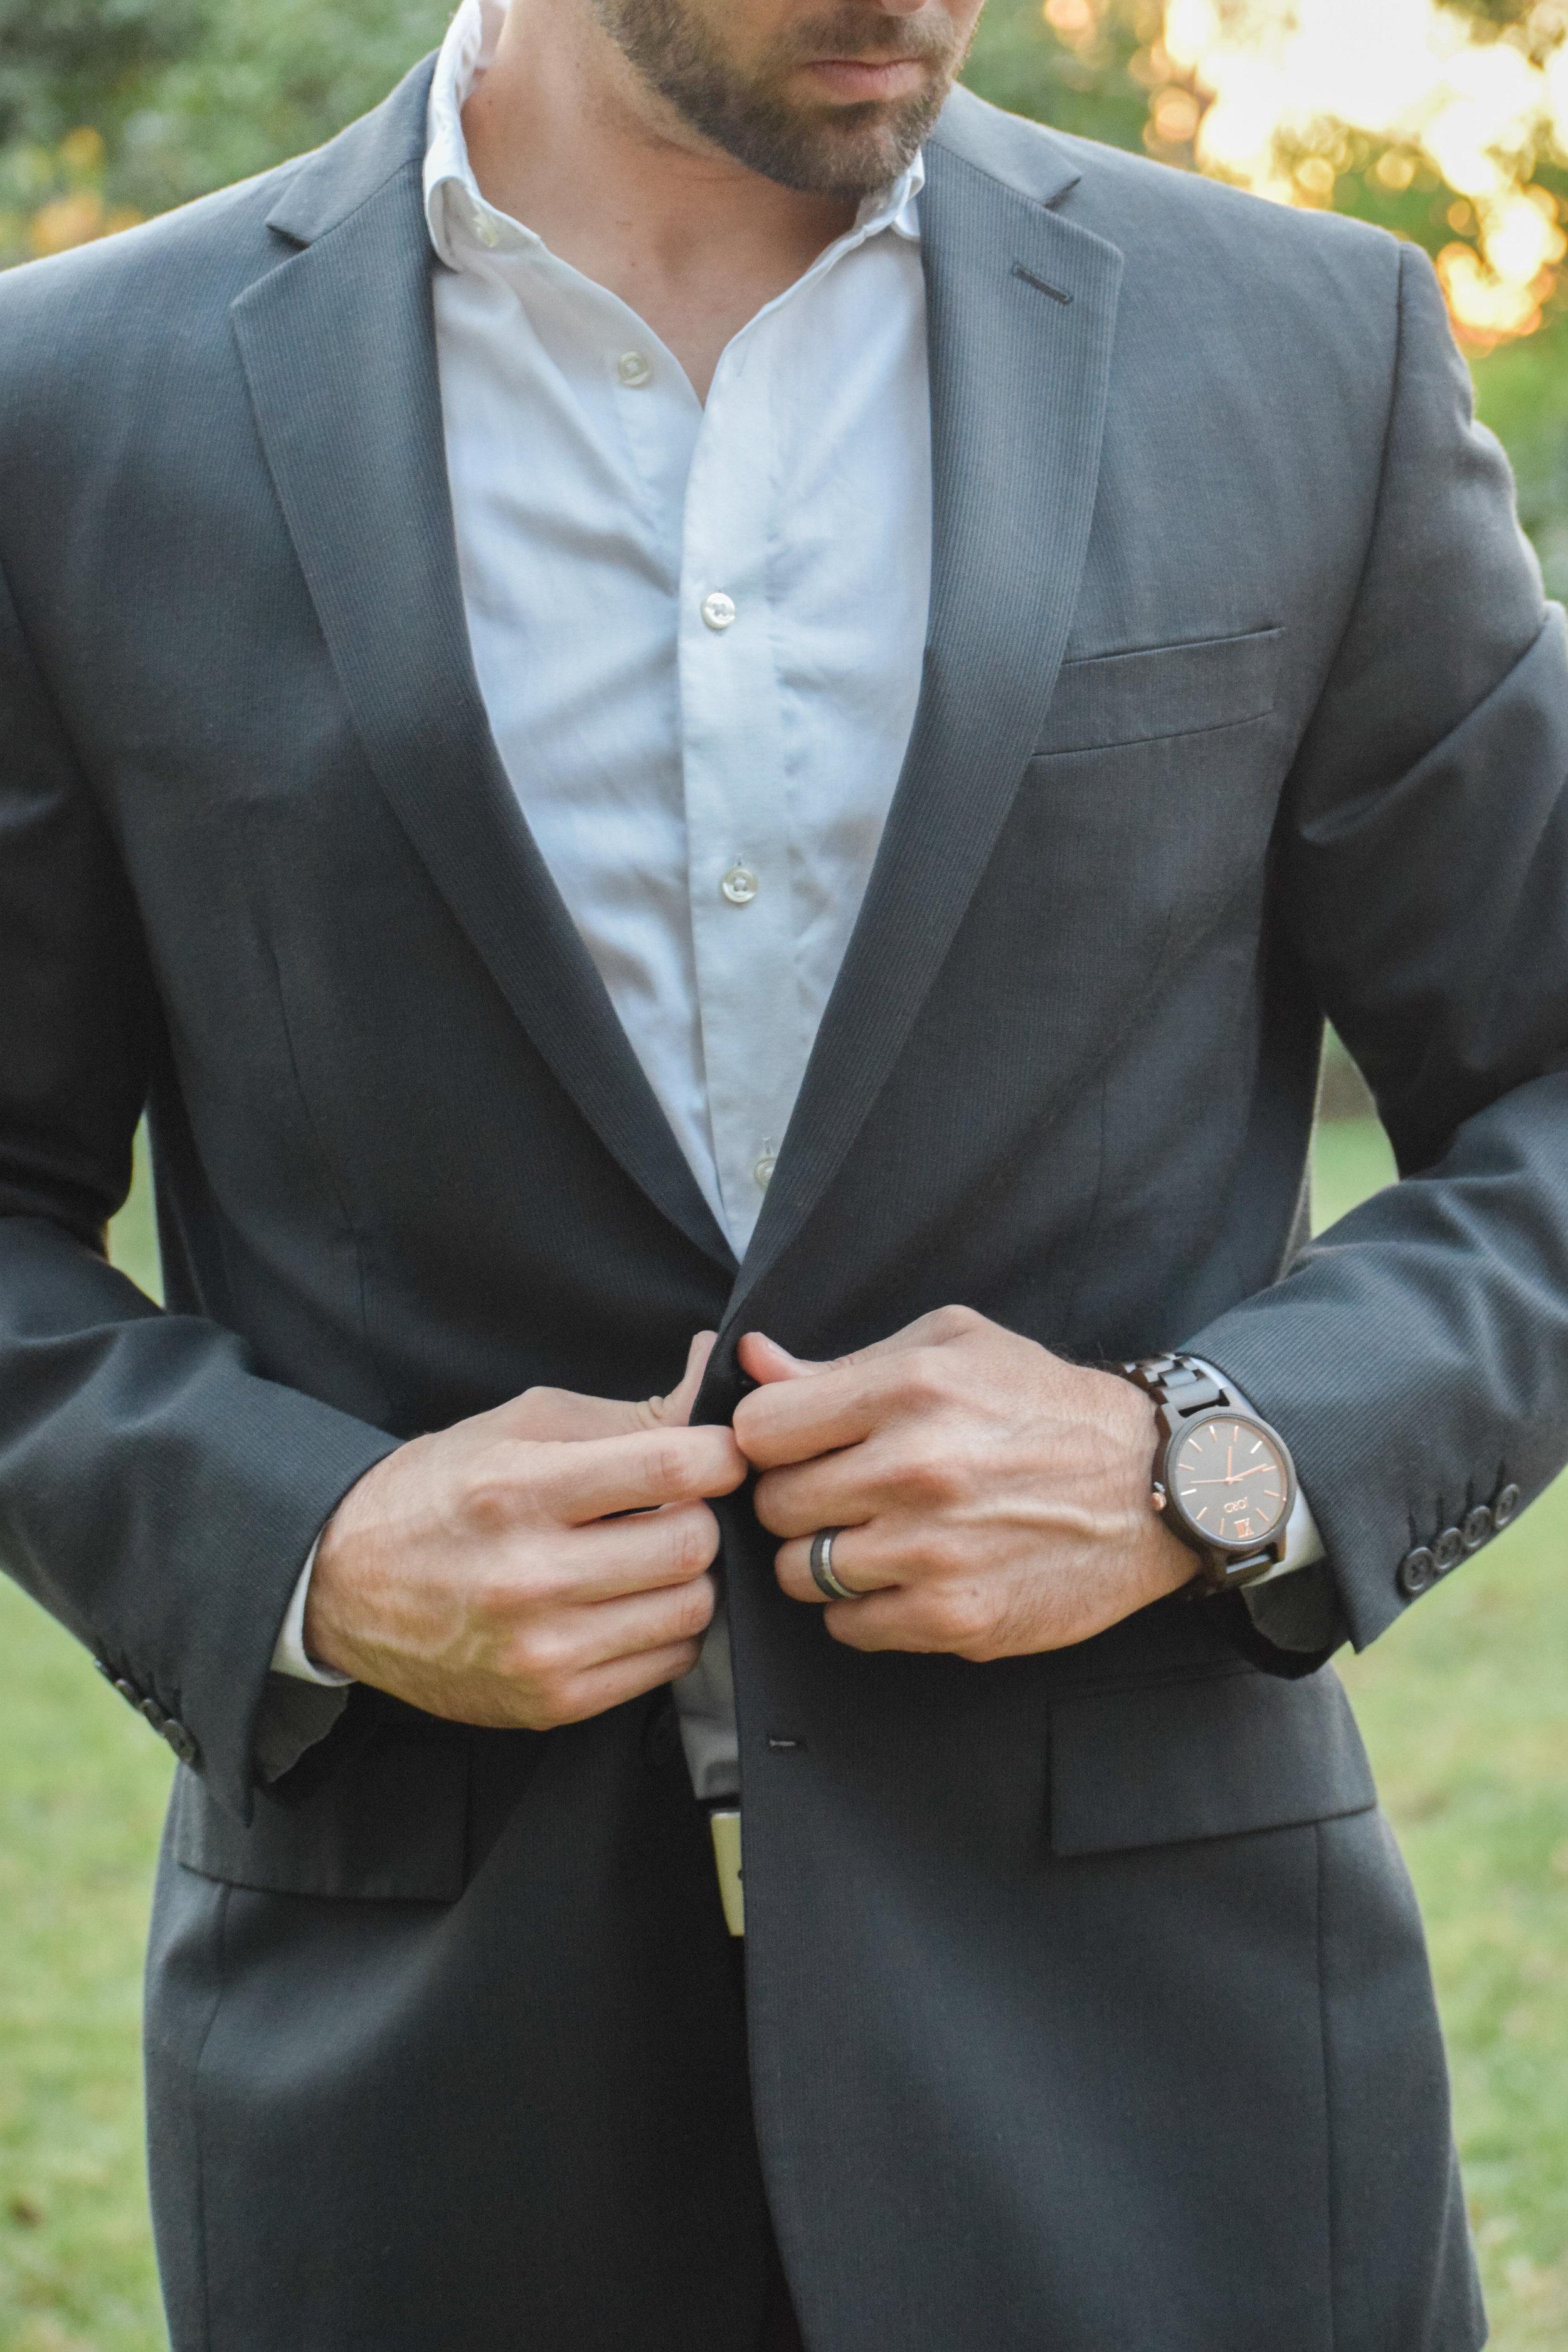 JORD Men's Wooden Watch - FRANKIE Series - Groom's Gift Idea